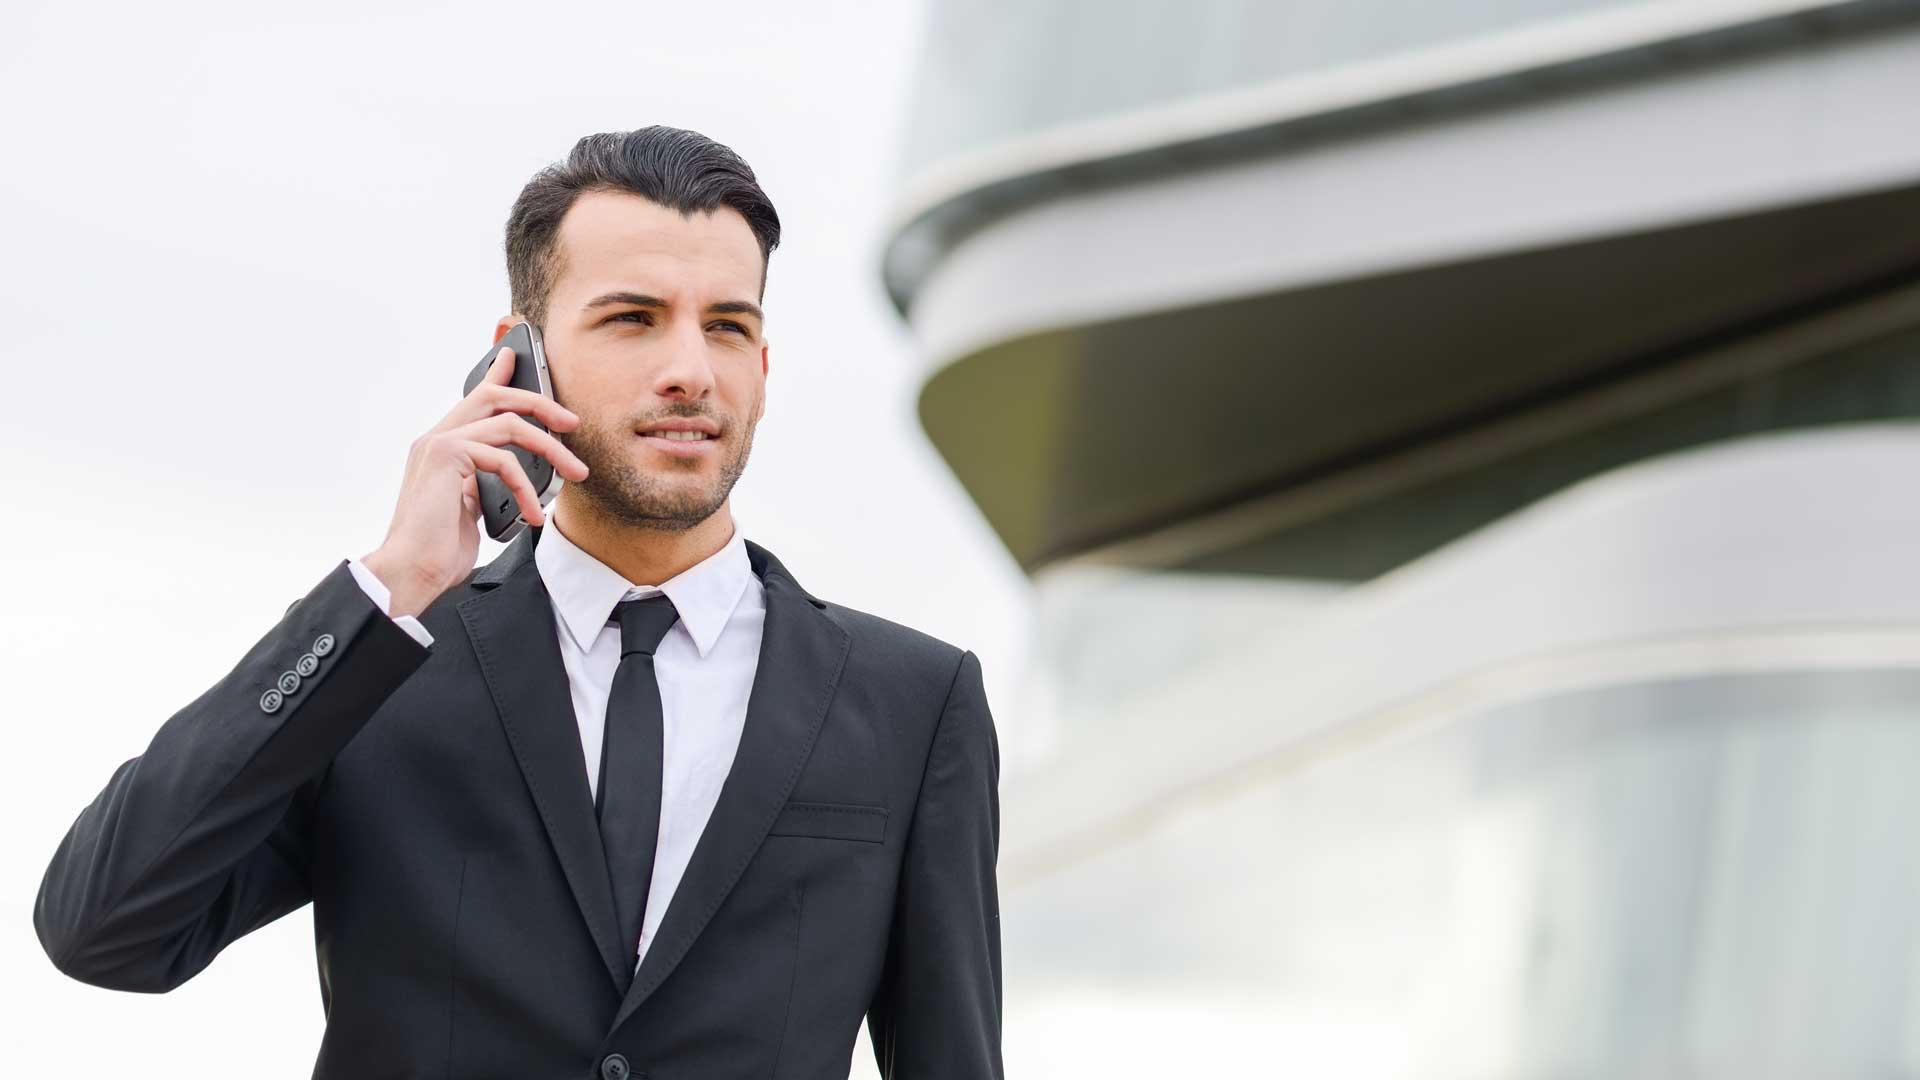 muškarac drži mobitel u ruci